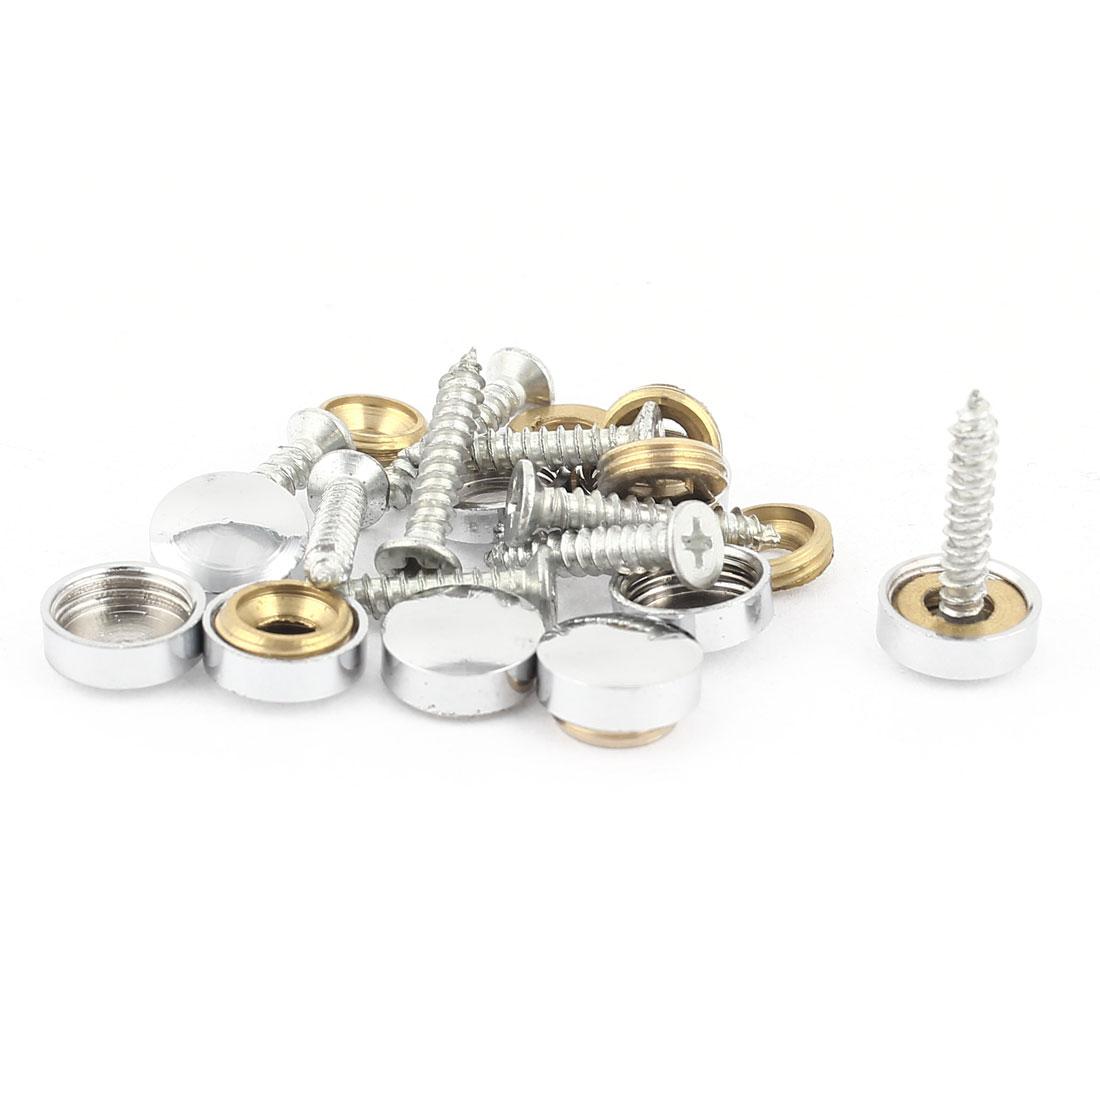 9 Pcs Silver Tone Decorative Fittings 12mm Screw Caps Tea Table Mirror Nails